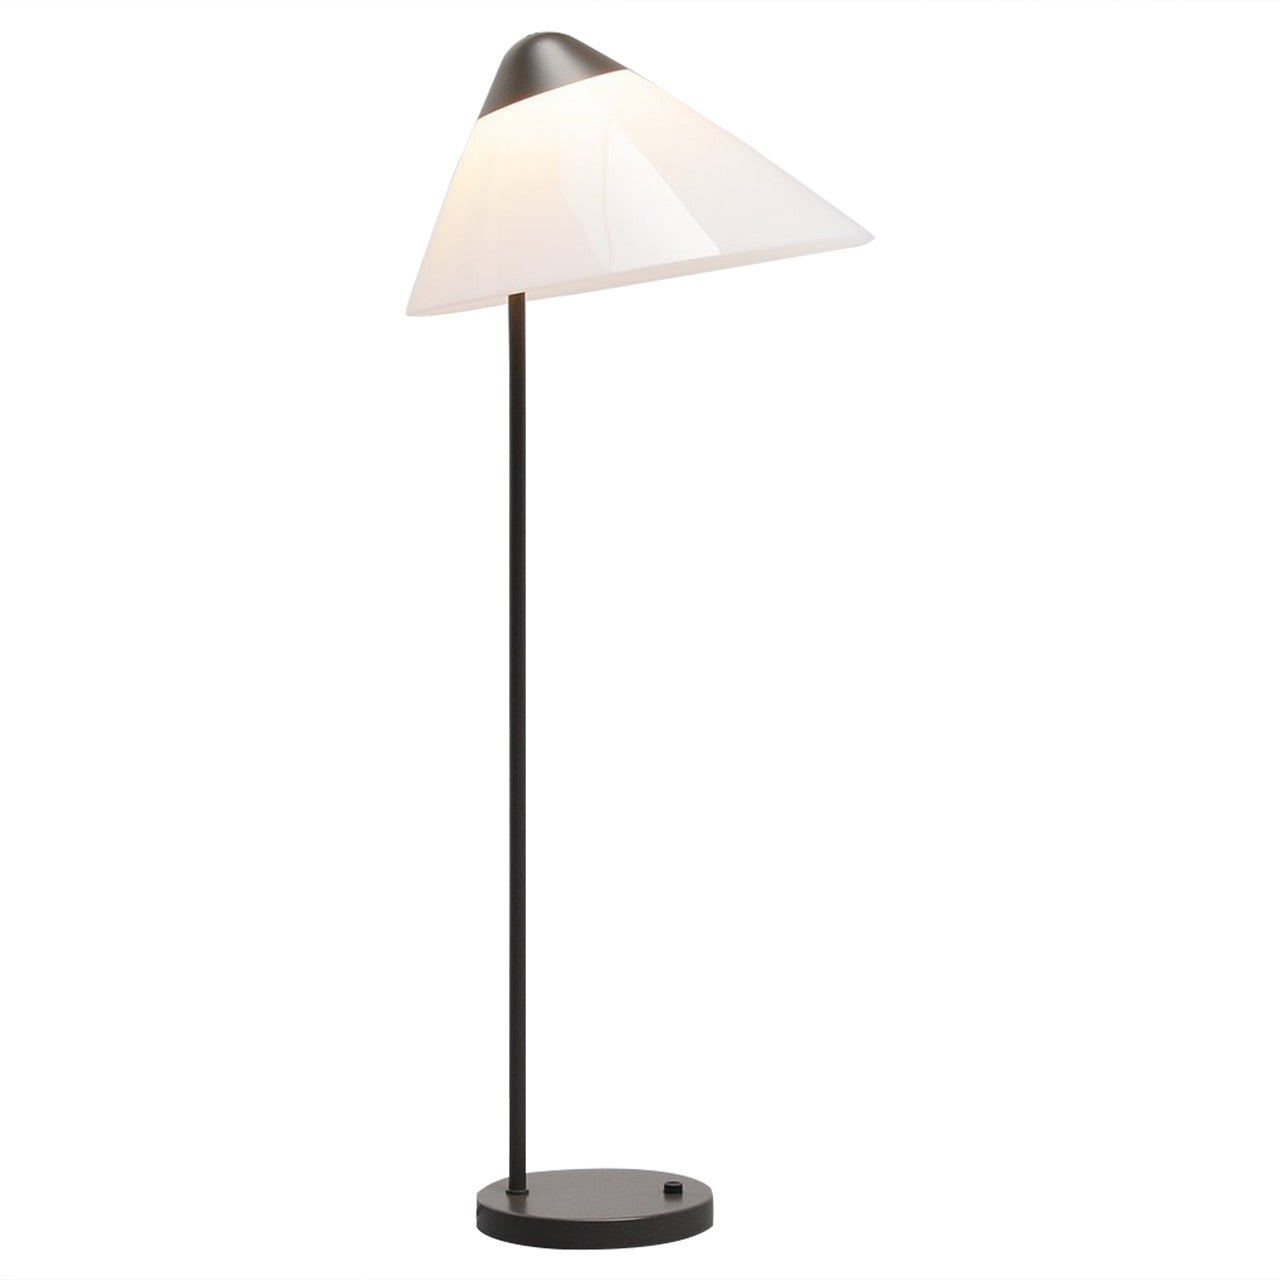 Hans Wegner Opala Floor Lamp, Louis Poulsen 1975